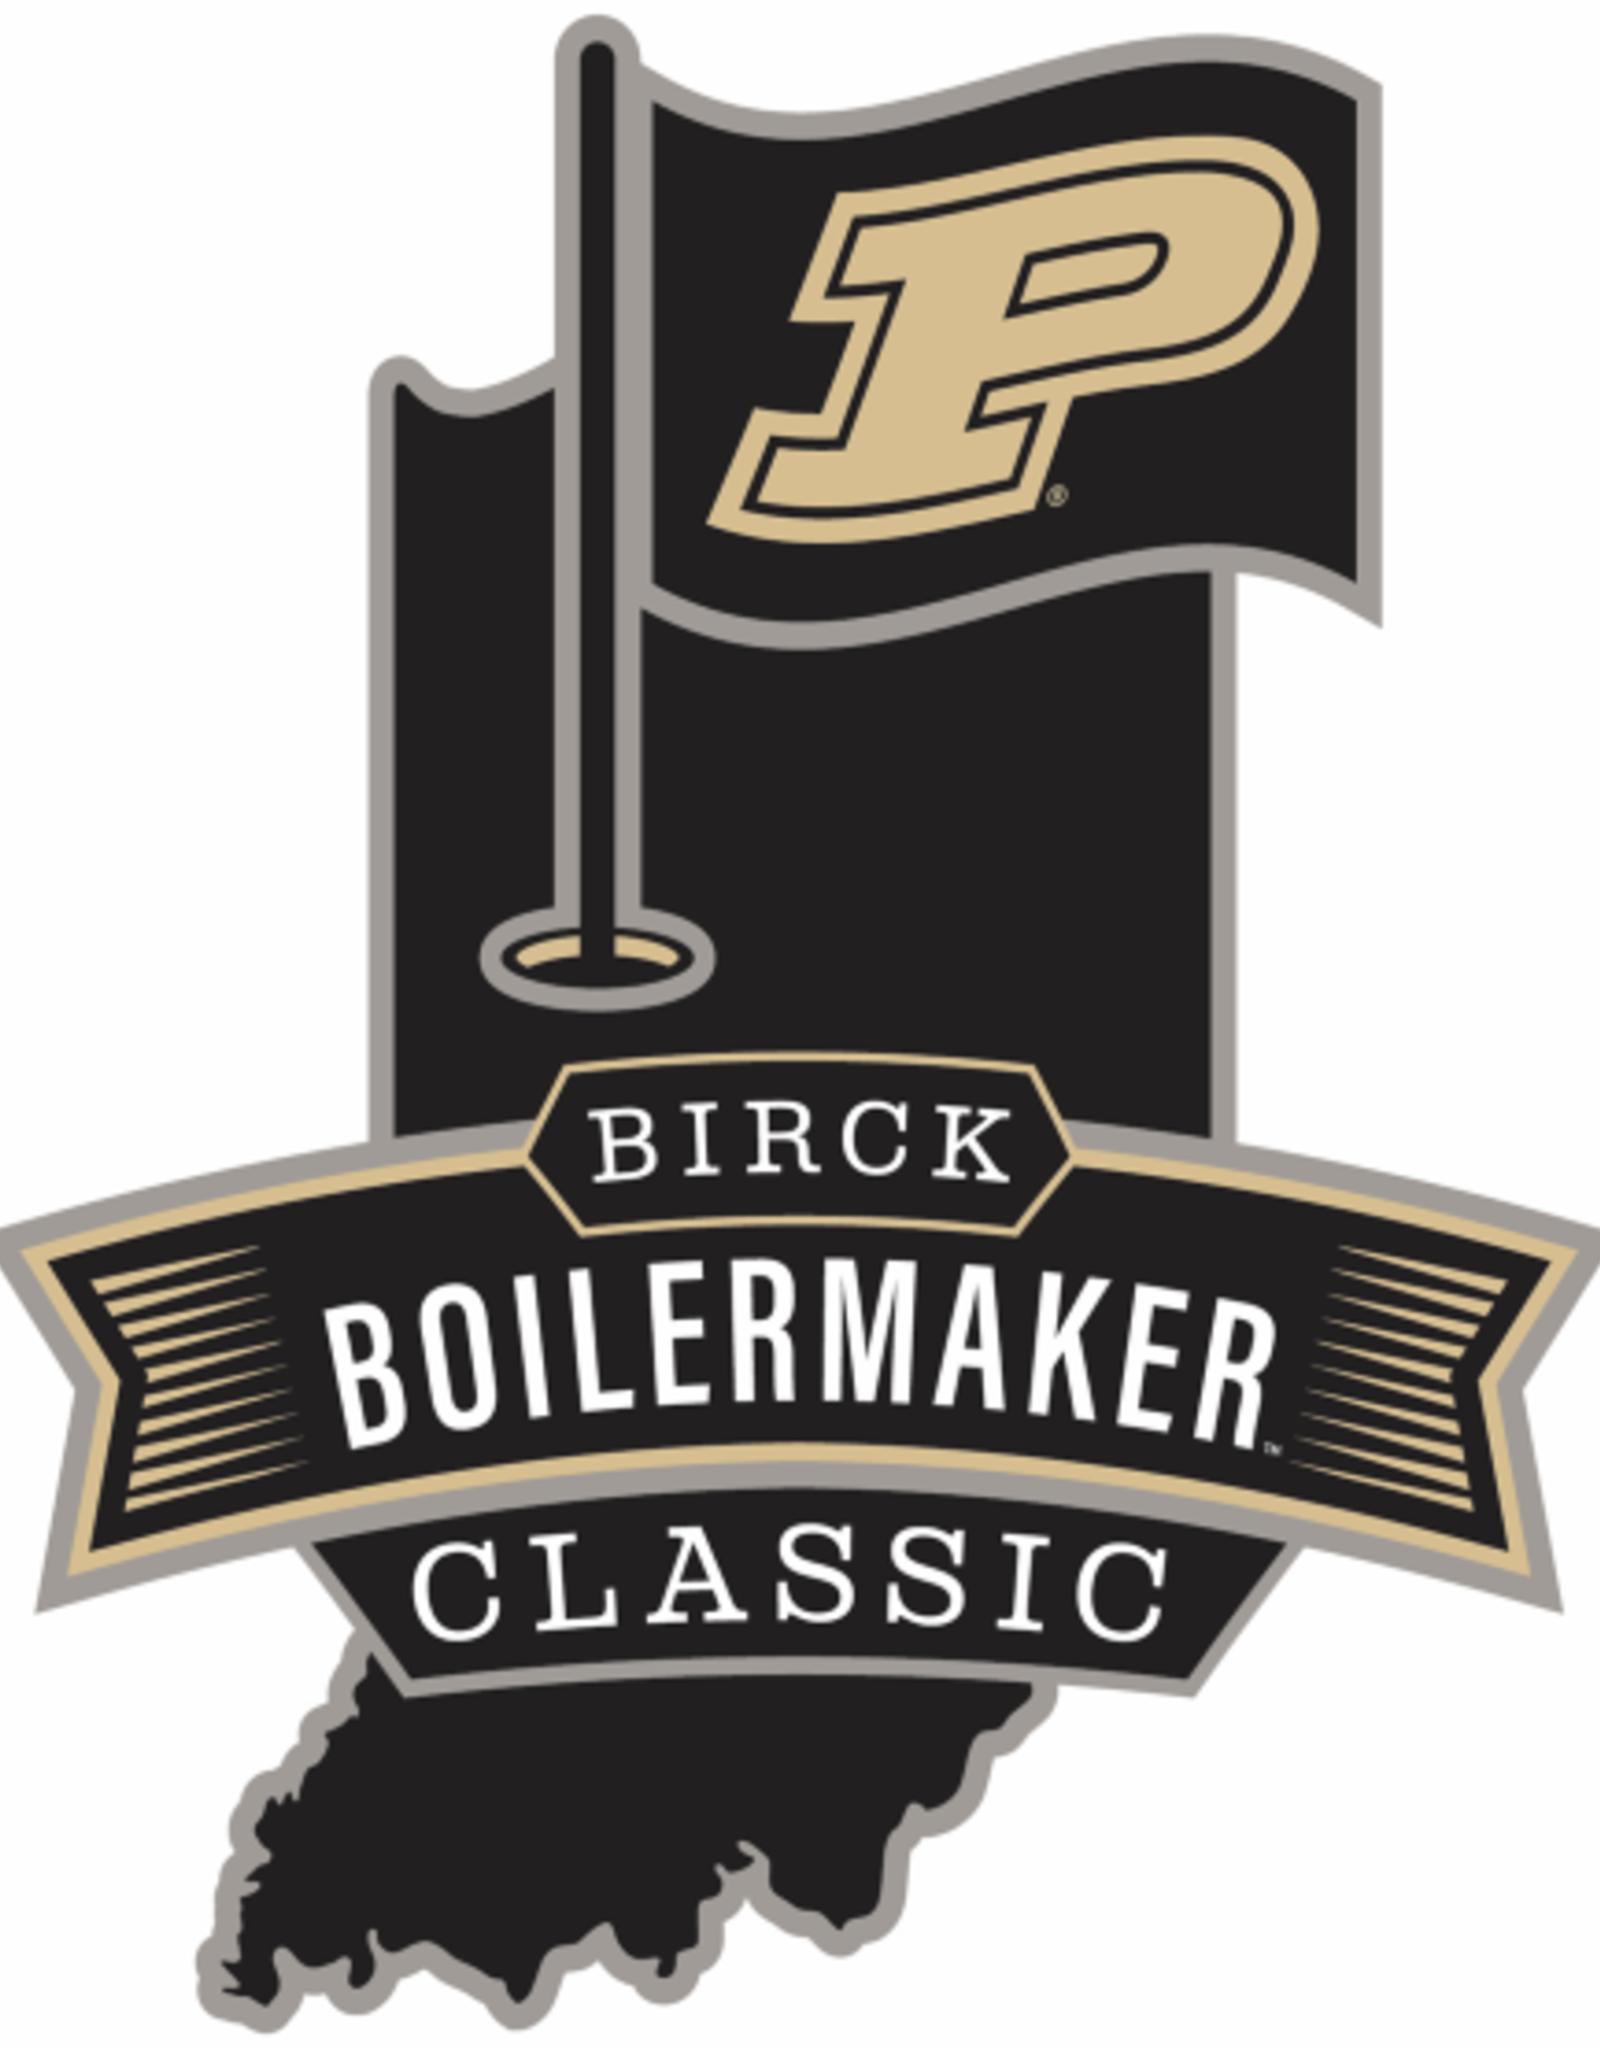 Birck Boilermaker Classic Pro-Am Registration